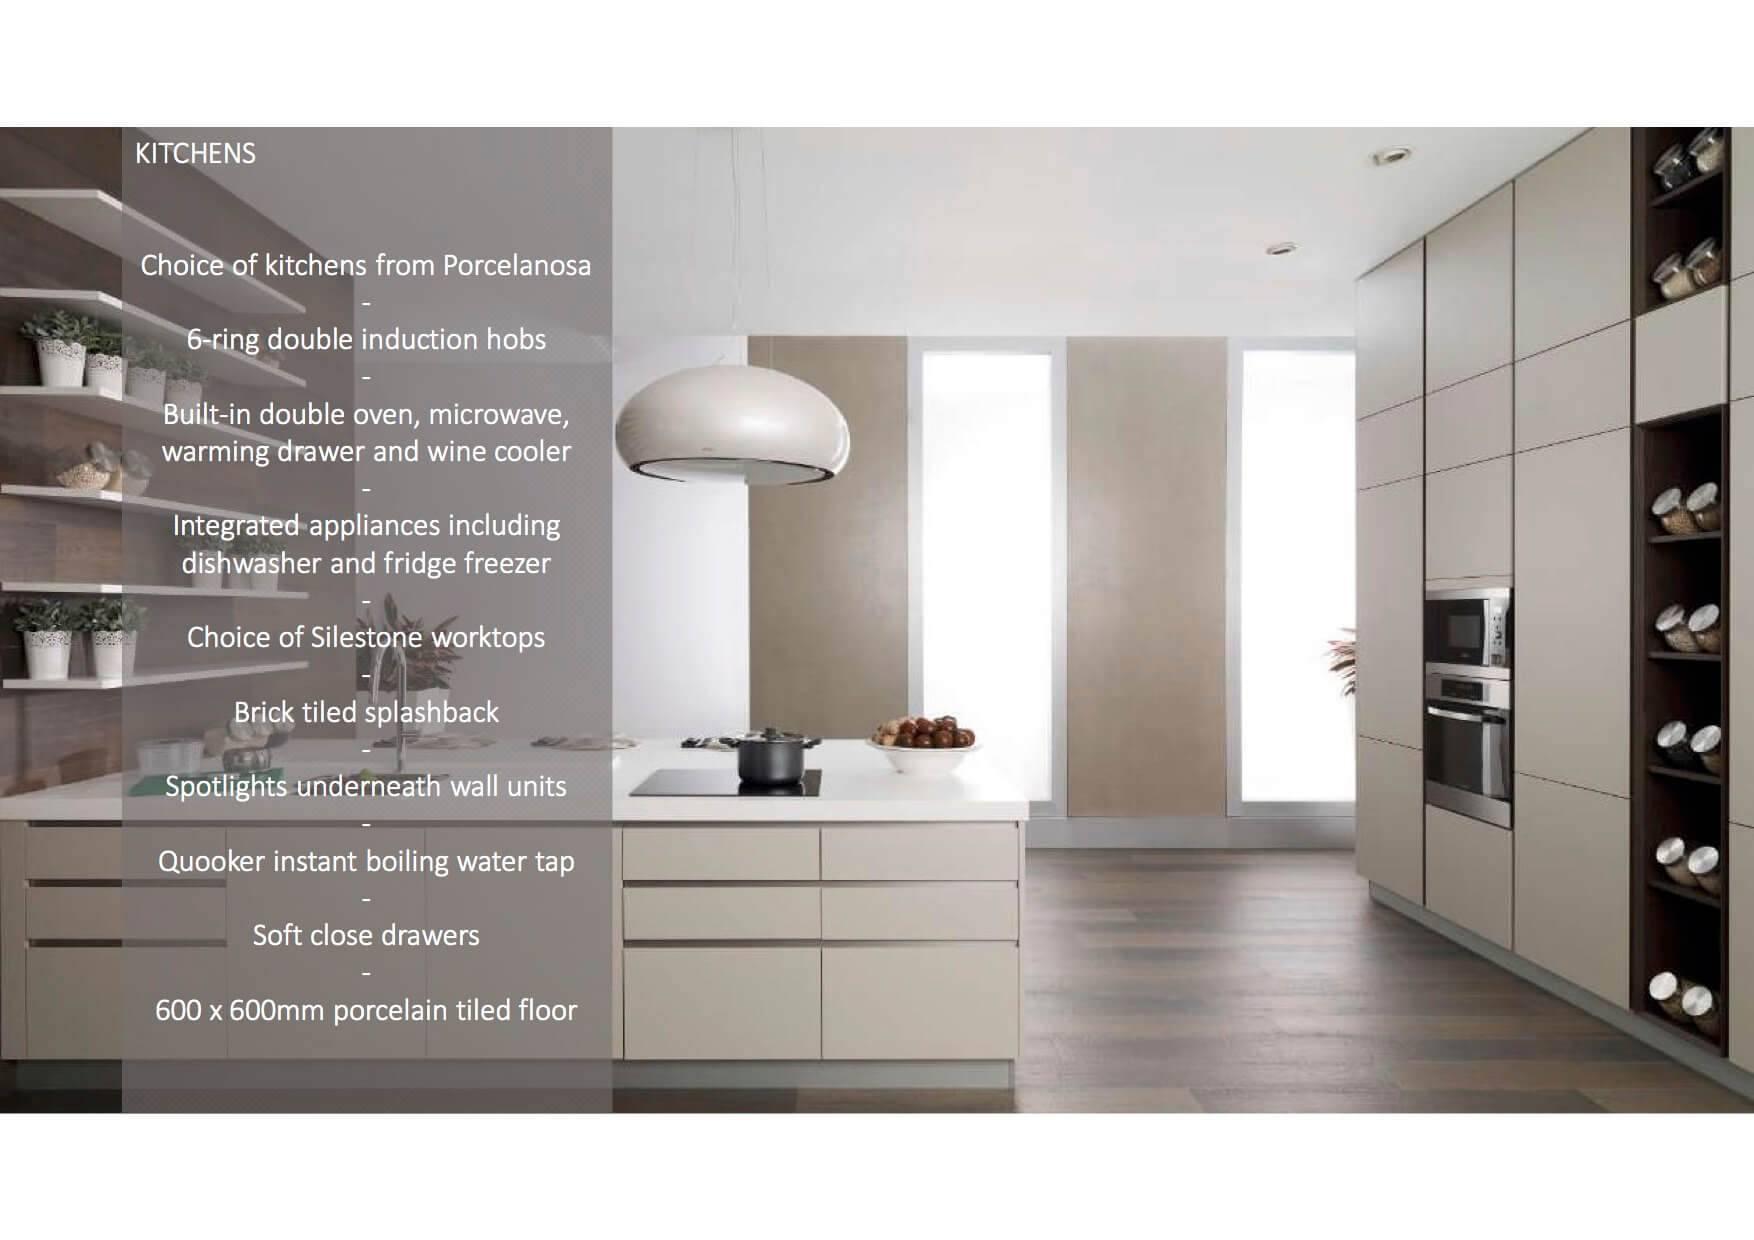 green print homes presentation site specification4 uk building